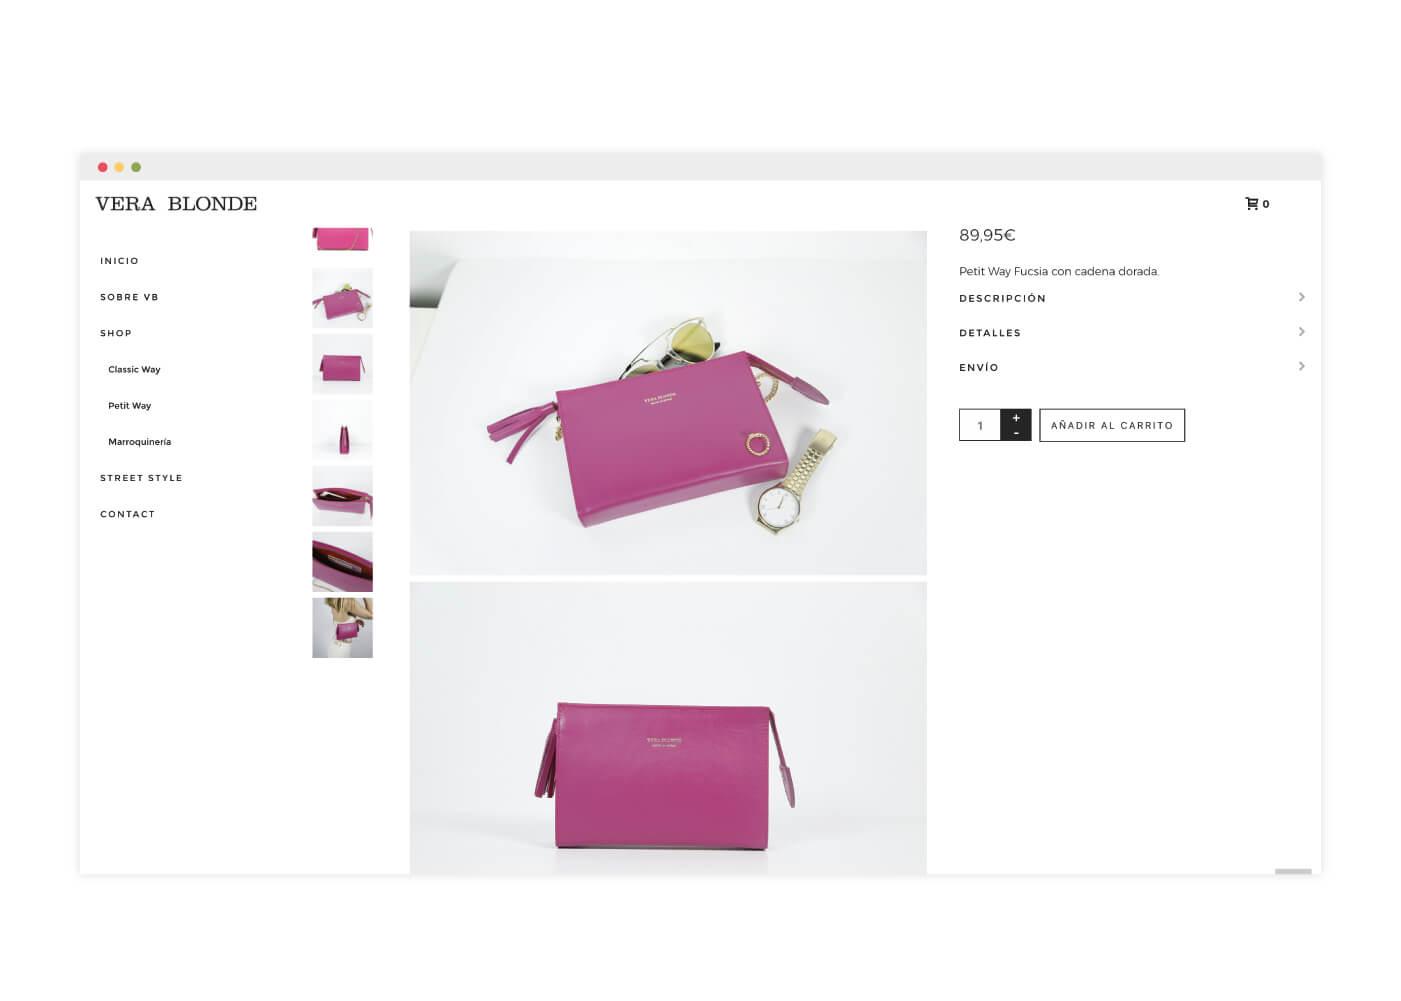 diseno-programacion-tienda-online-bolsos-vera-blonde-8